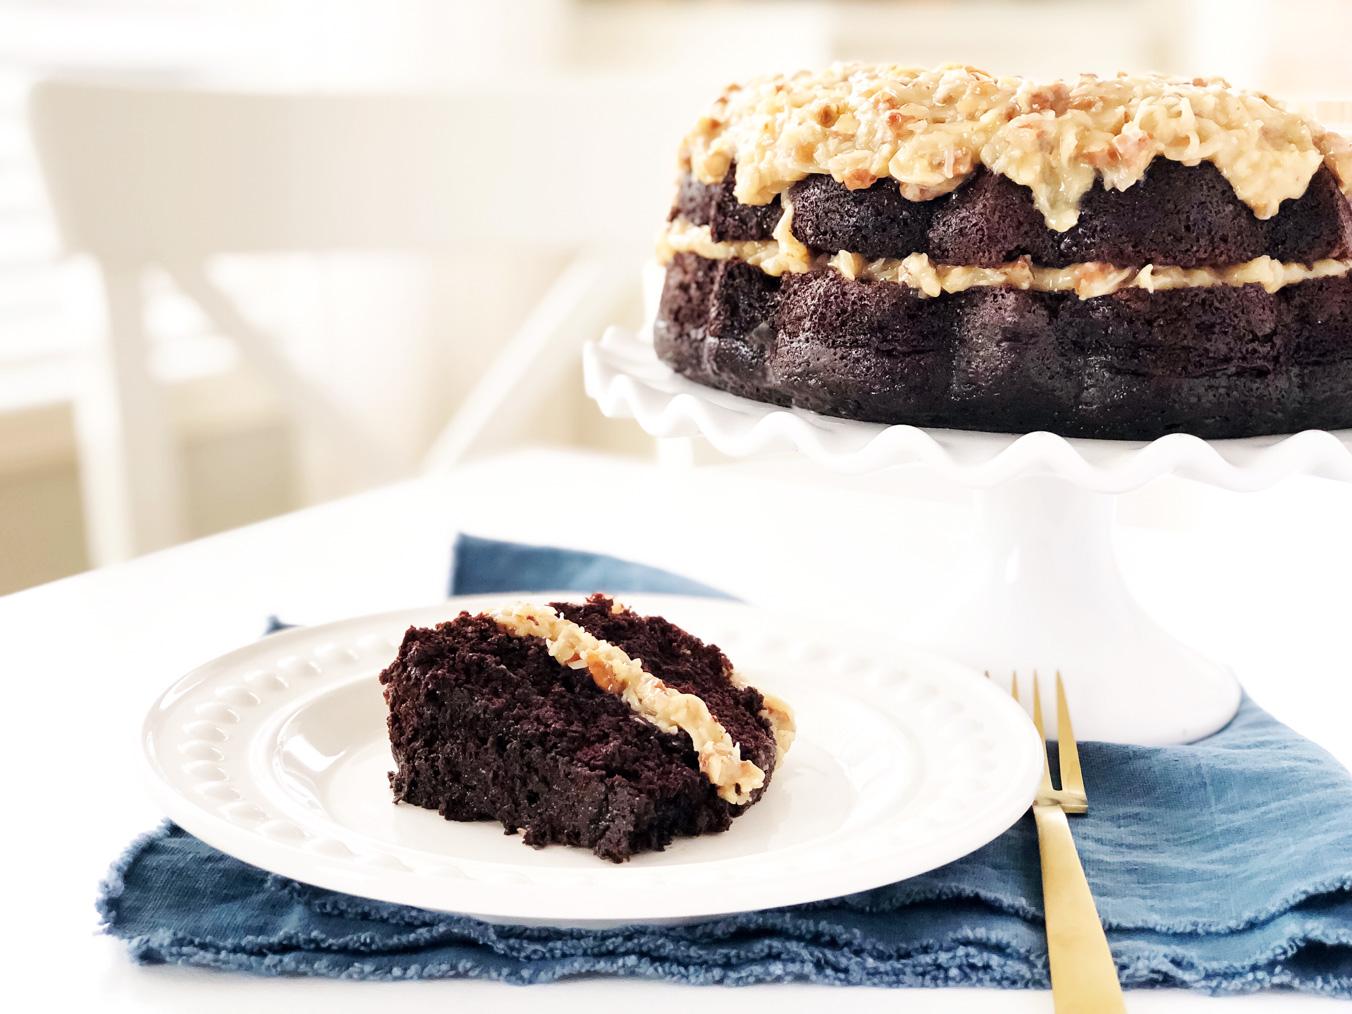 The Most Chocolatey German Chocolate Cake